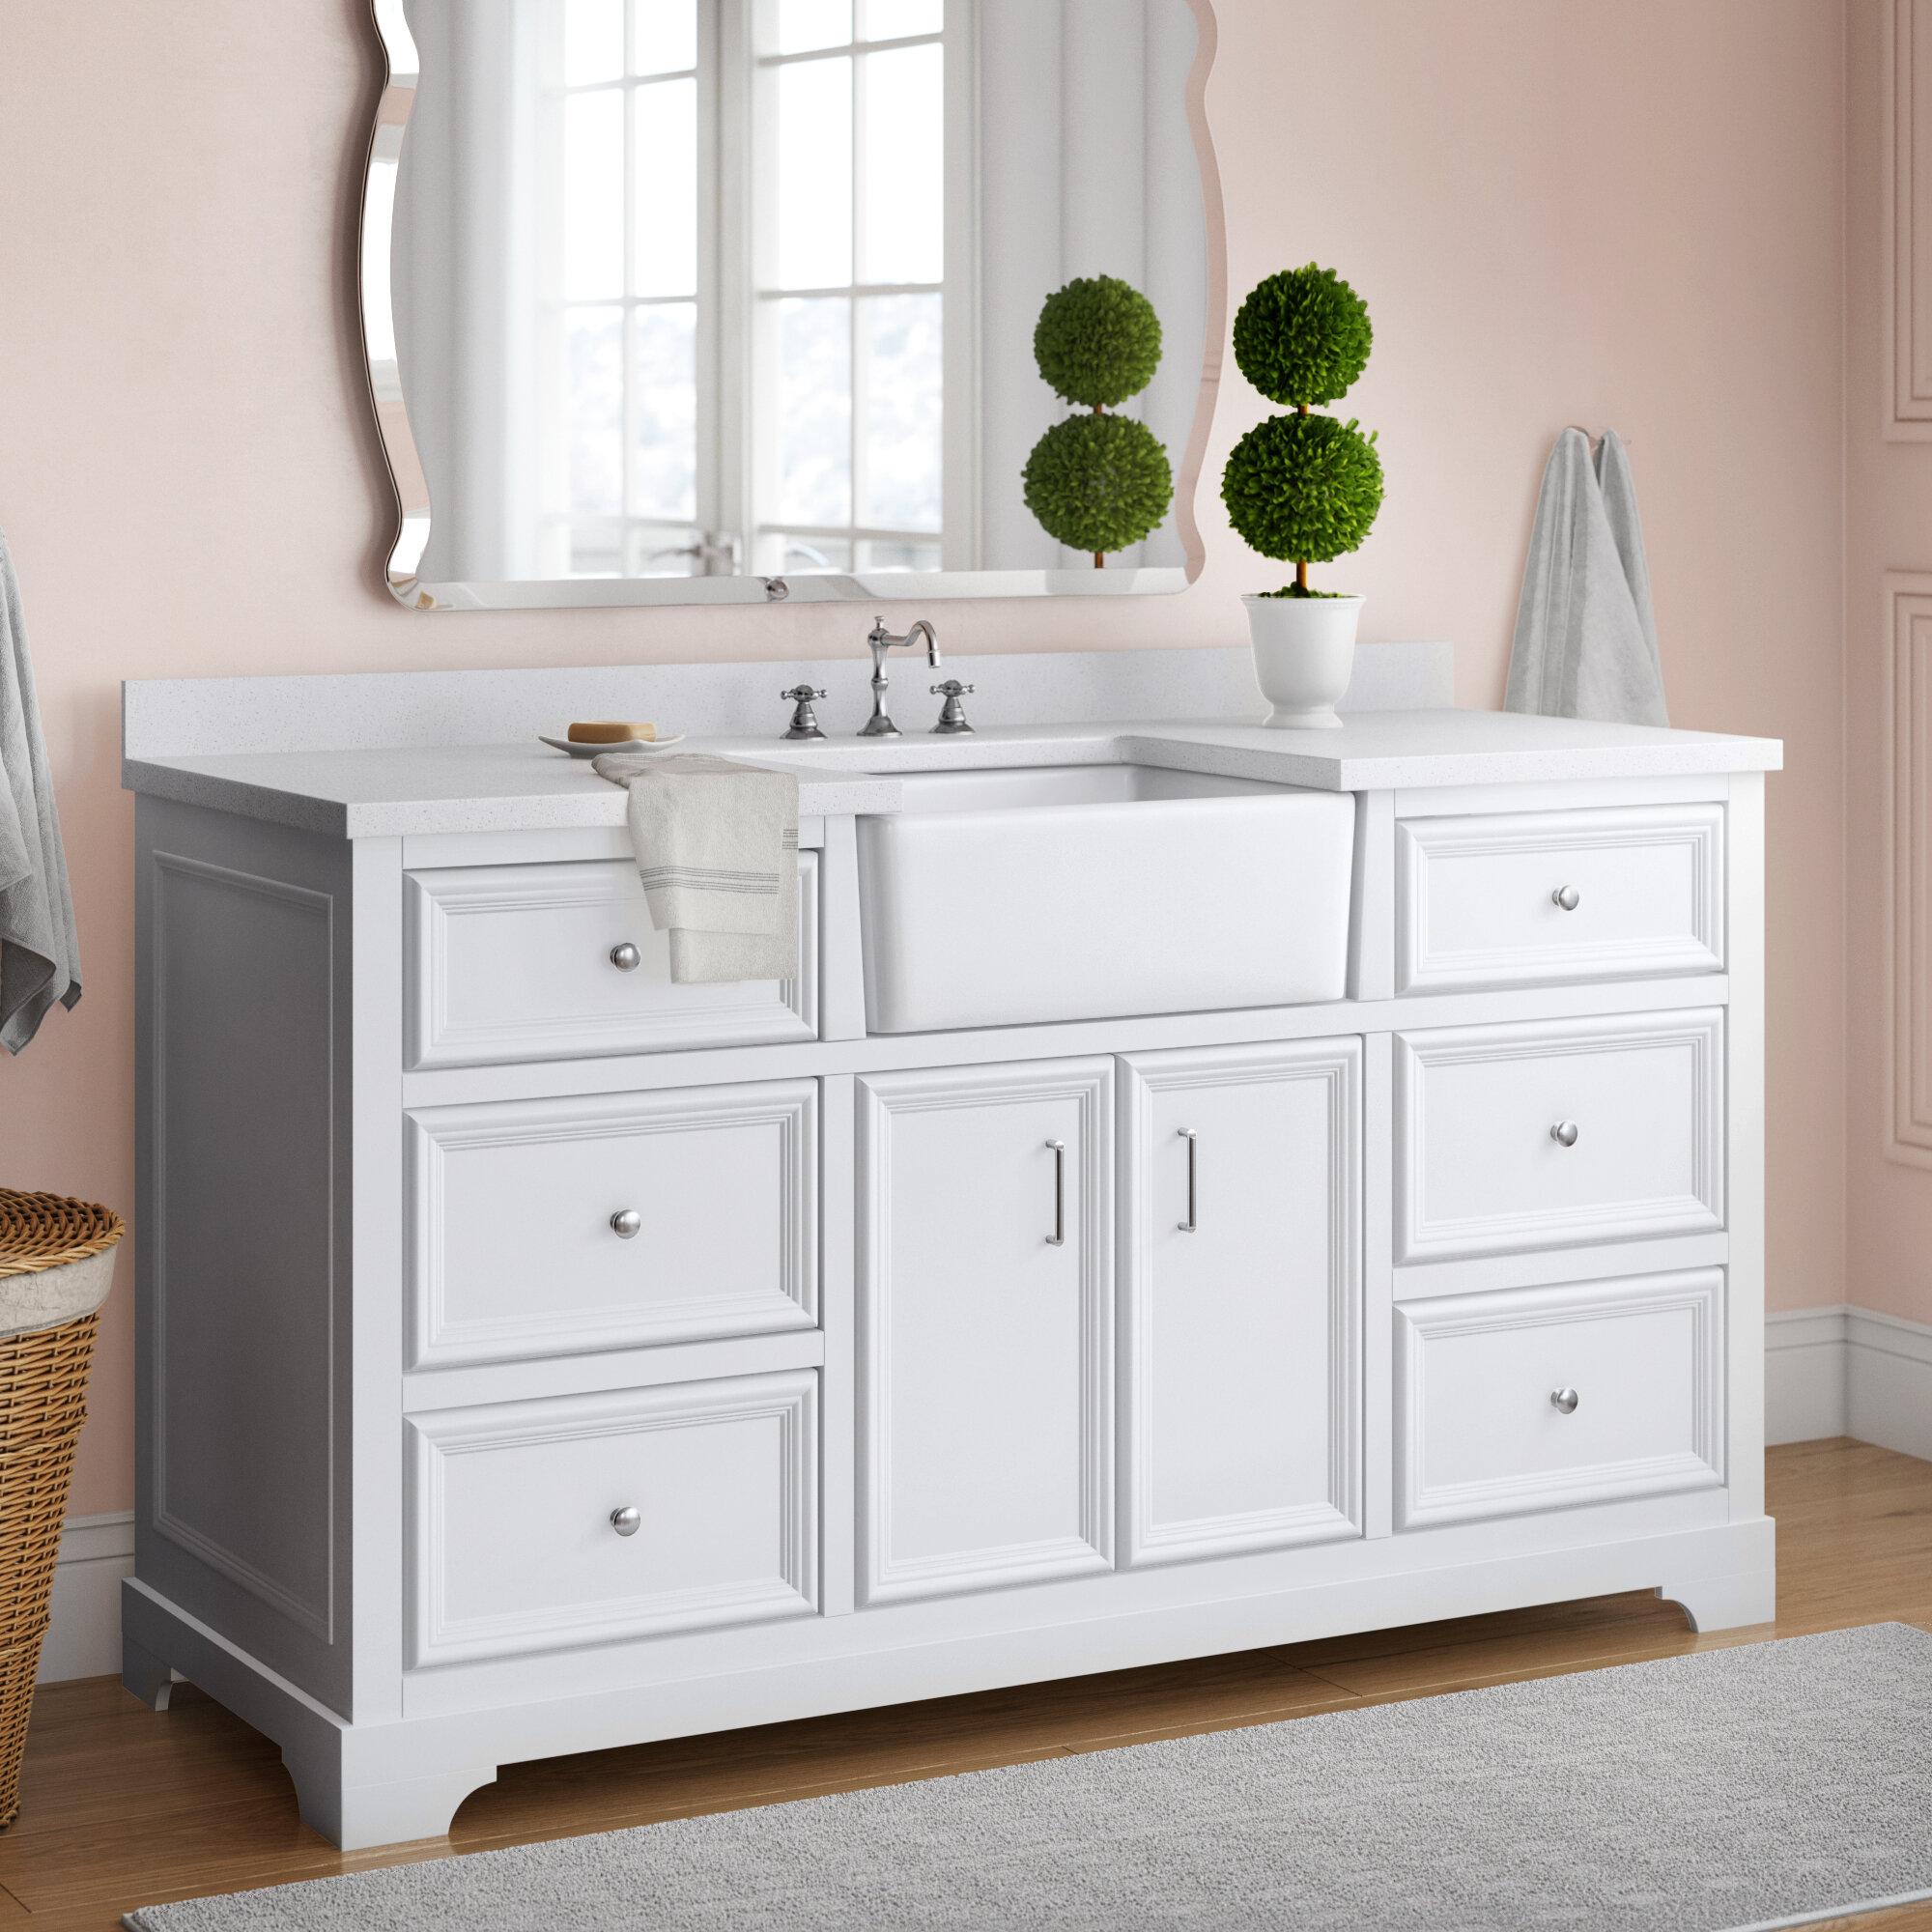 Coastal Farmhouse Emiliano 60 Single Bathroom Vanity Set Reviews Wayfair